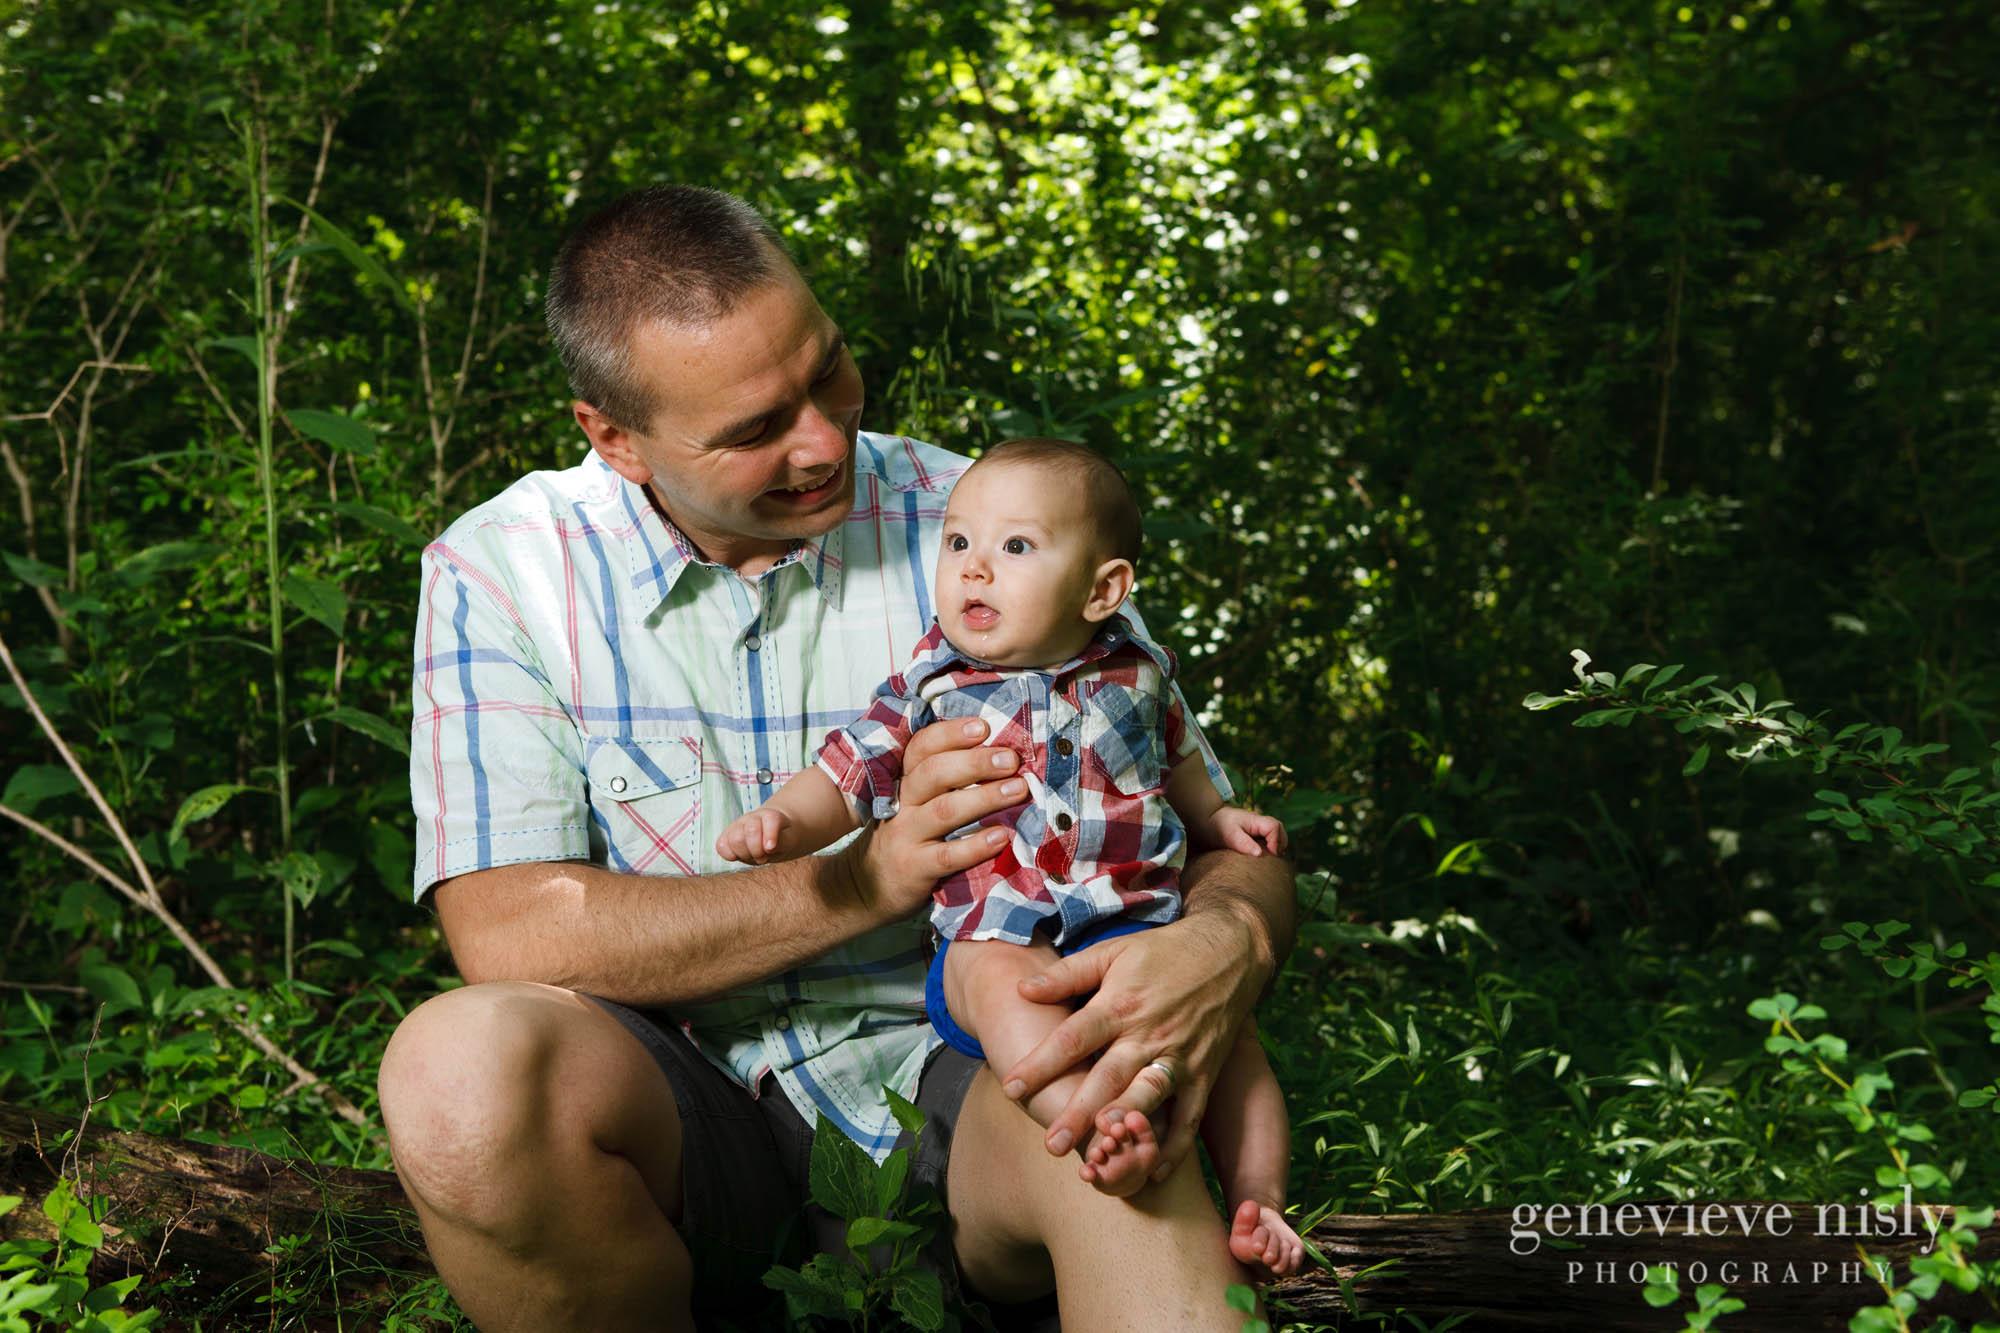 Copyright Genevieve Nisly Photography, Family, Ohio, Peninsula, Portraits, Summer